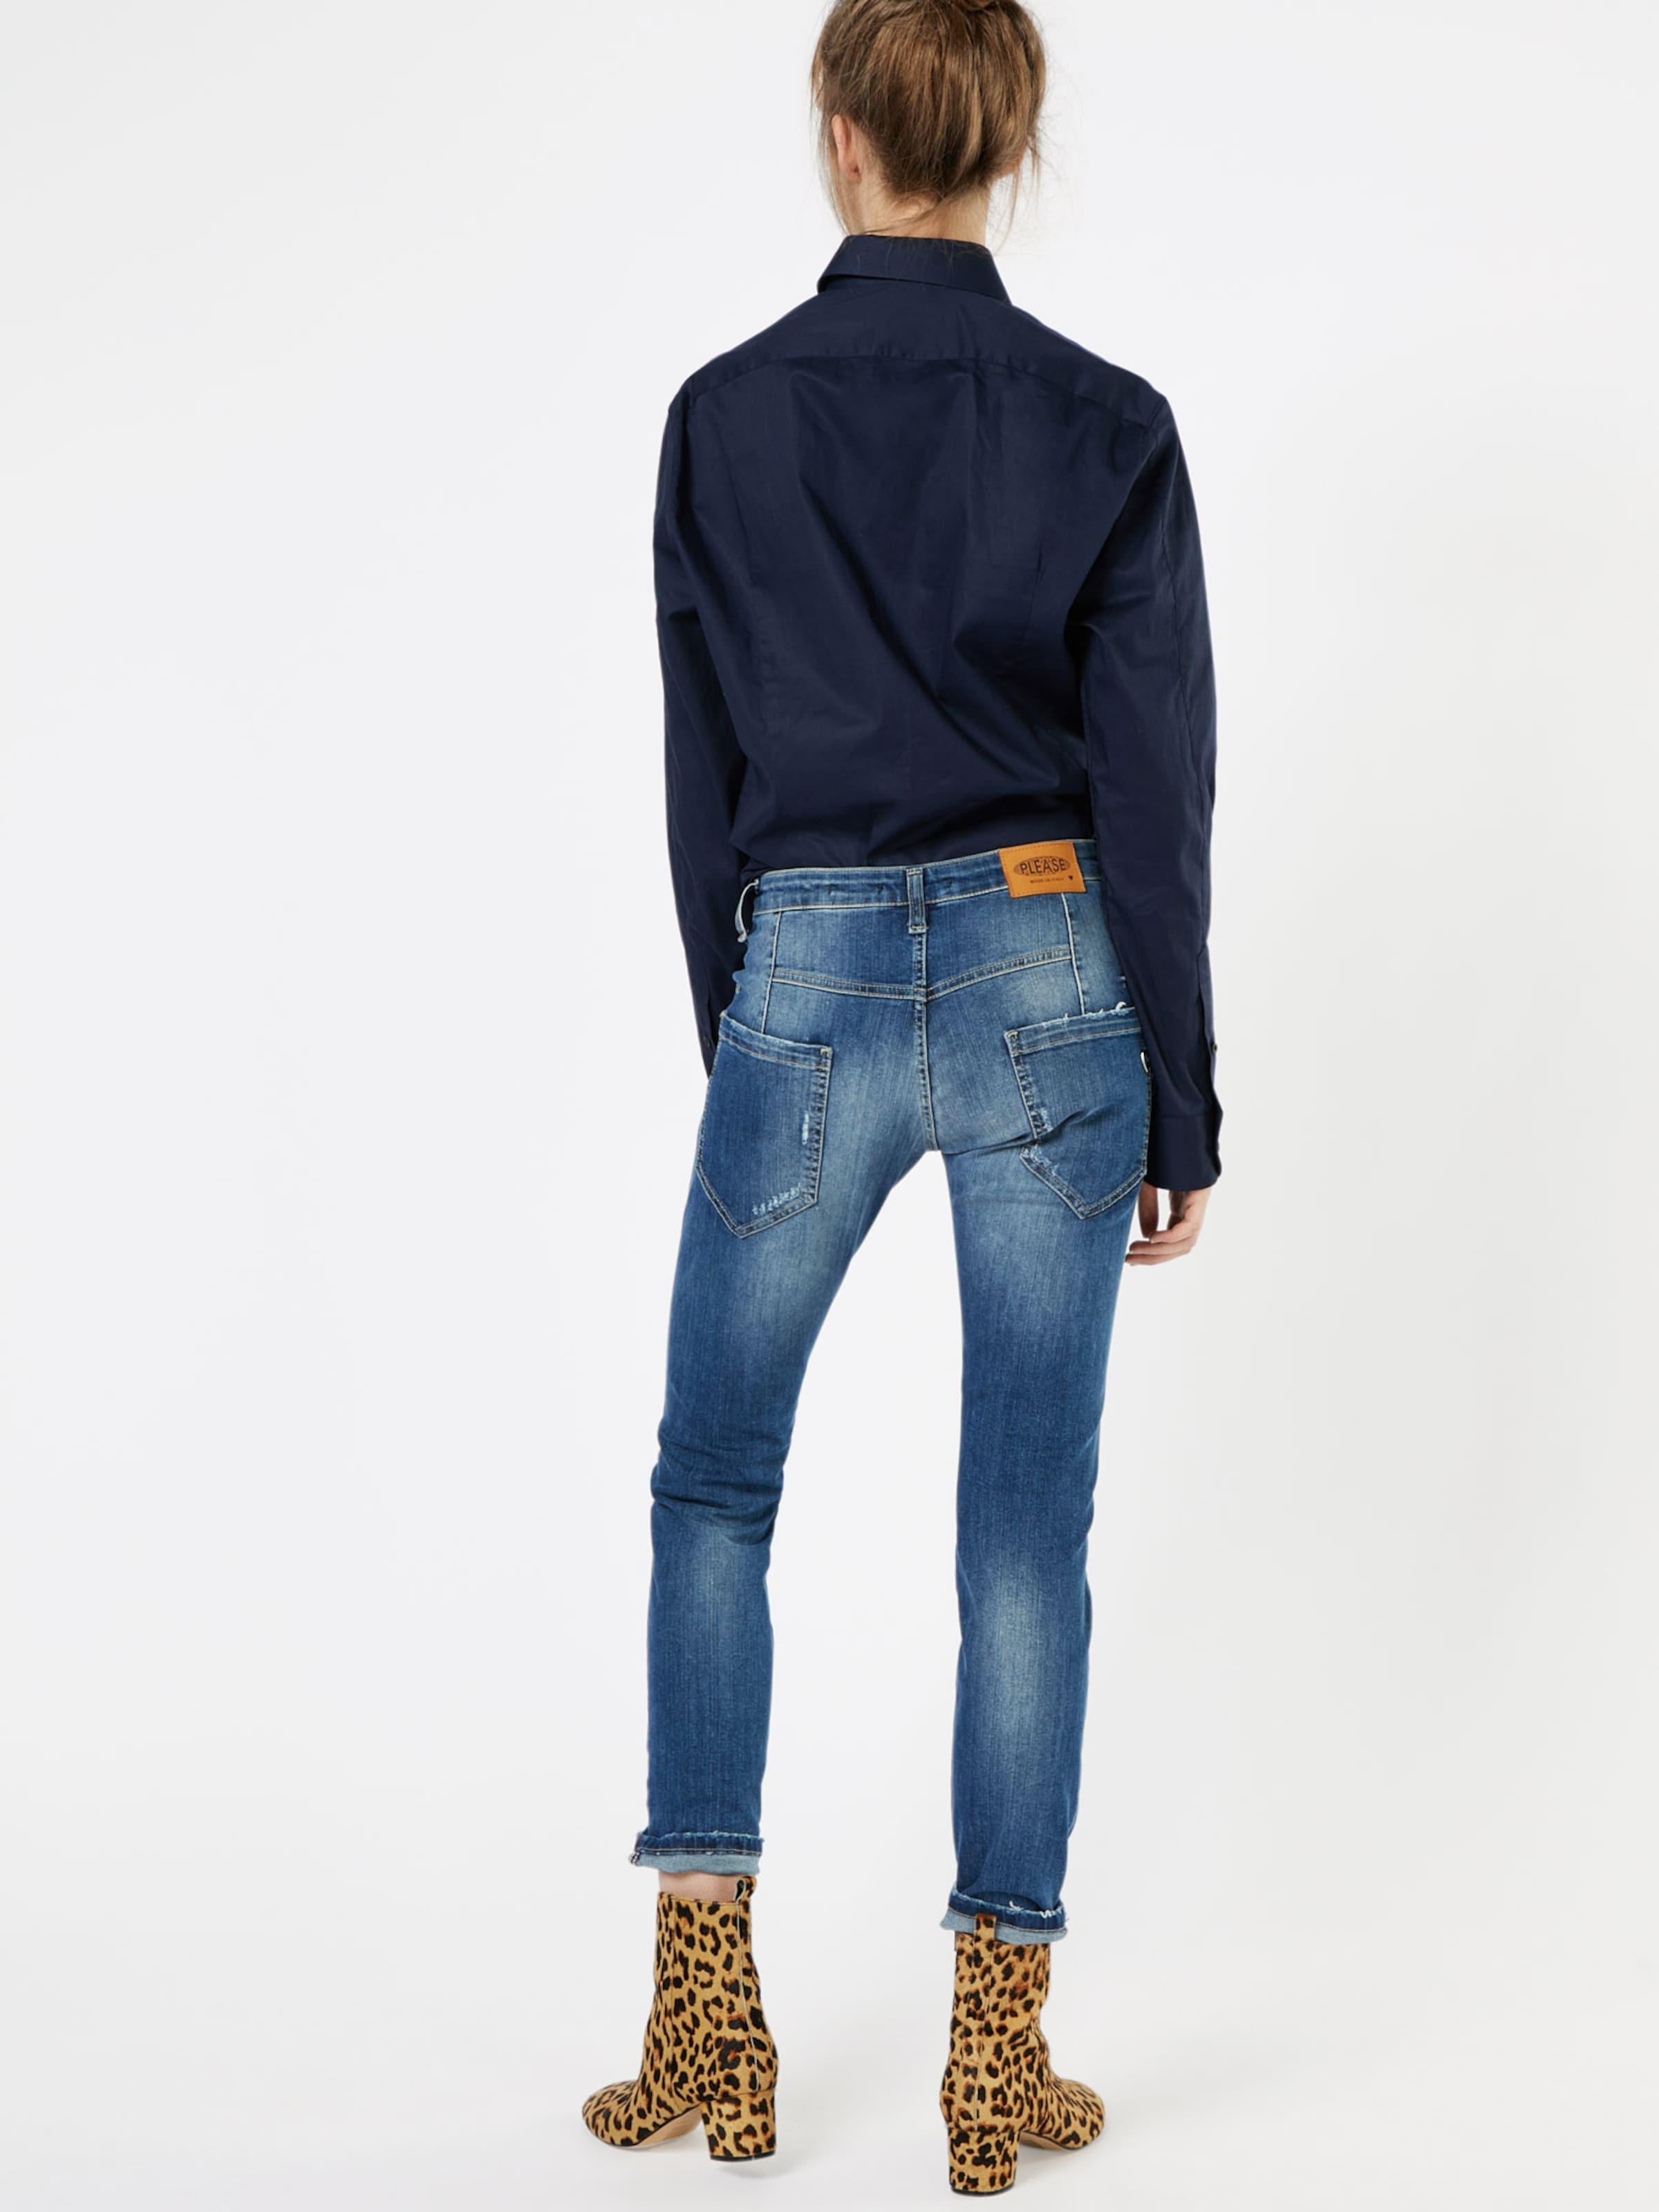 Rabatte Für Verkauf PLEASE Loosefit Jeans 'Boyfriend' Bulk-Design Rabatt Rabatt-Websites QkVEmh